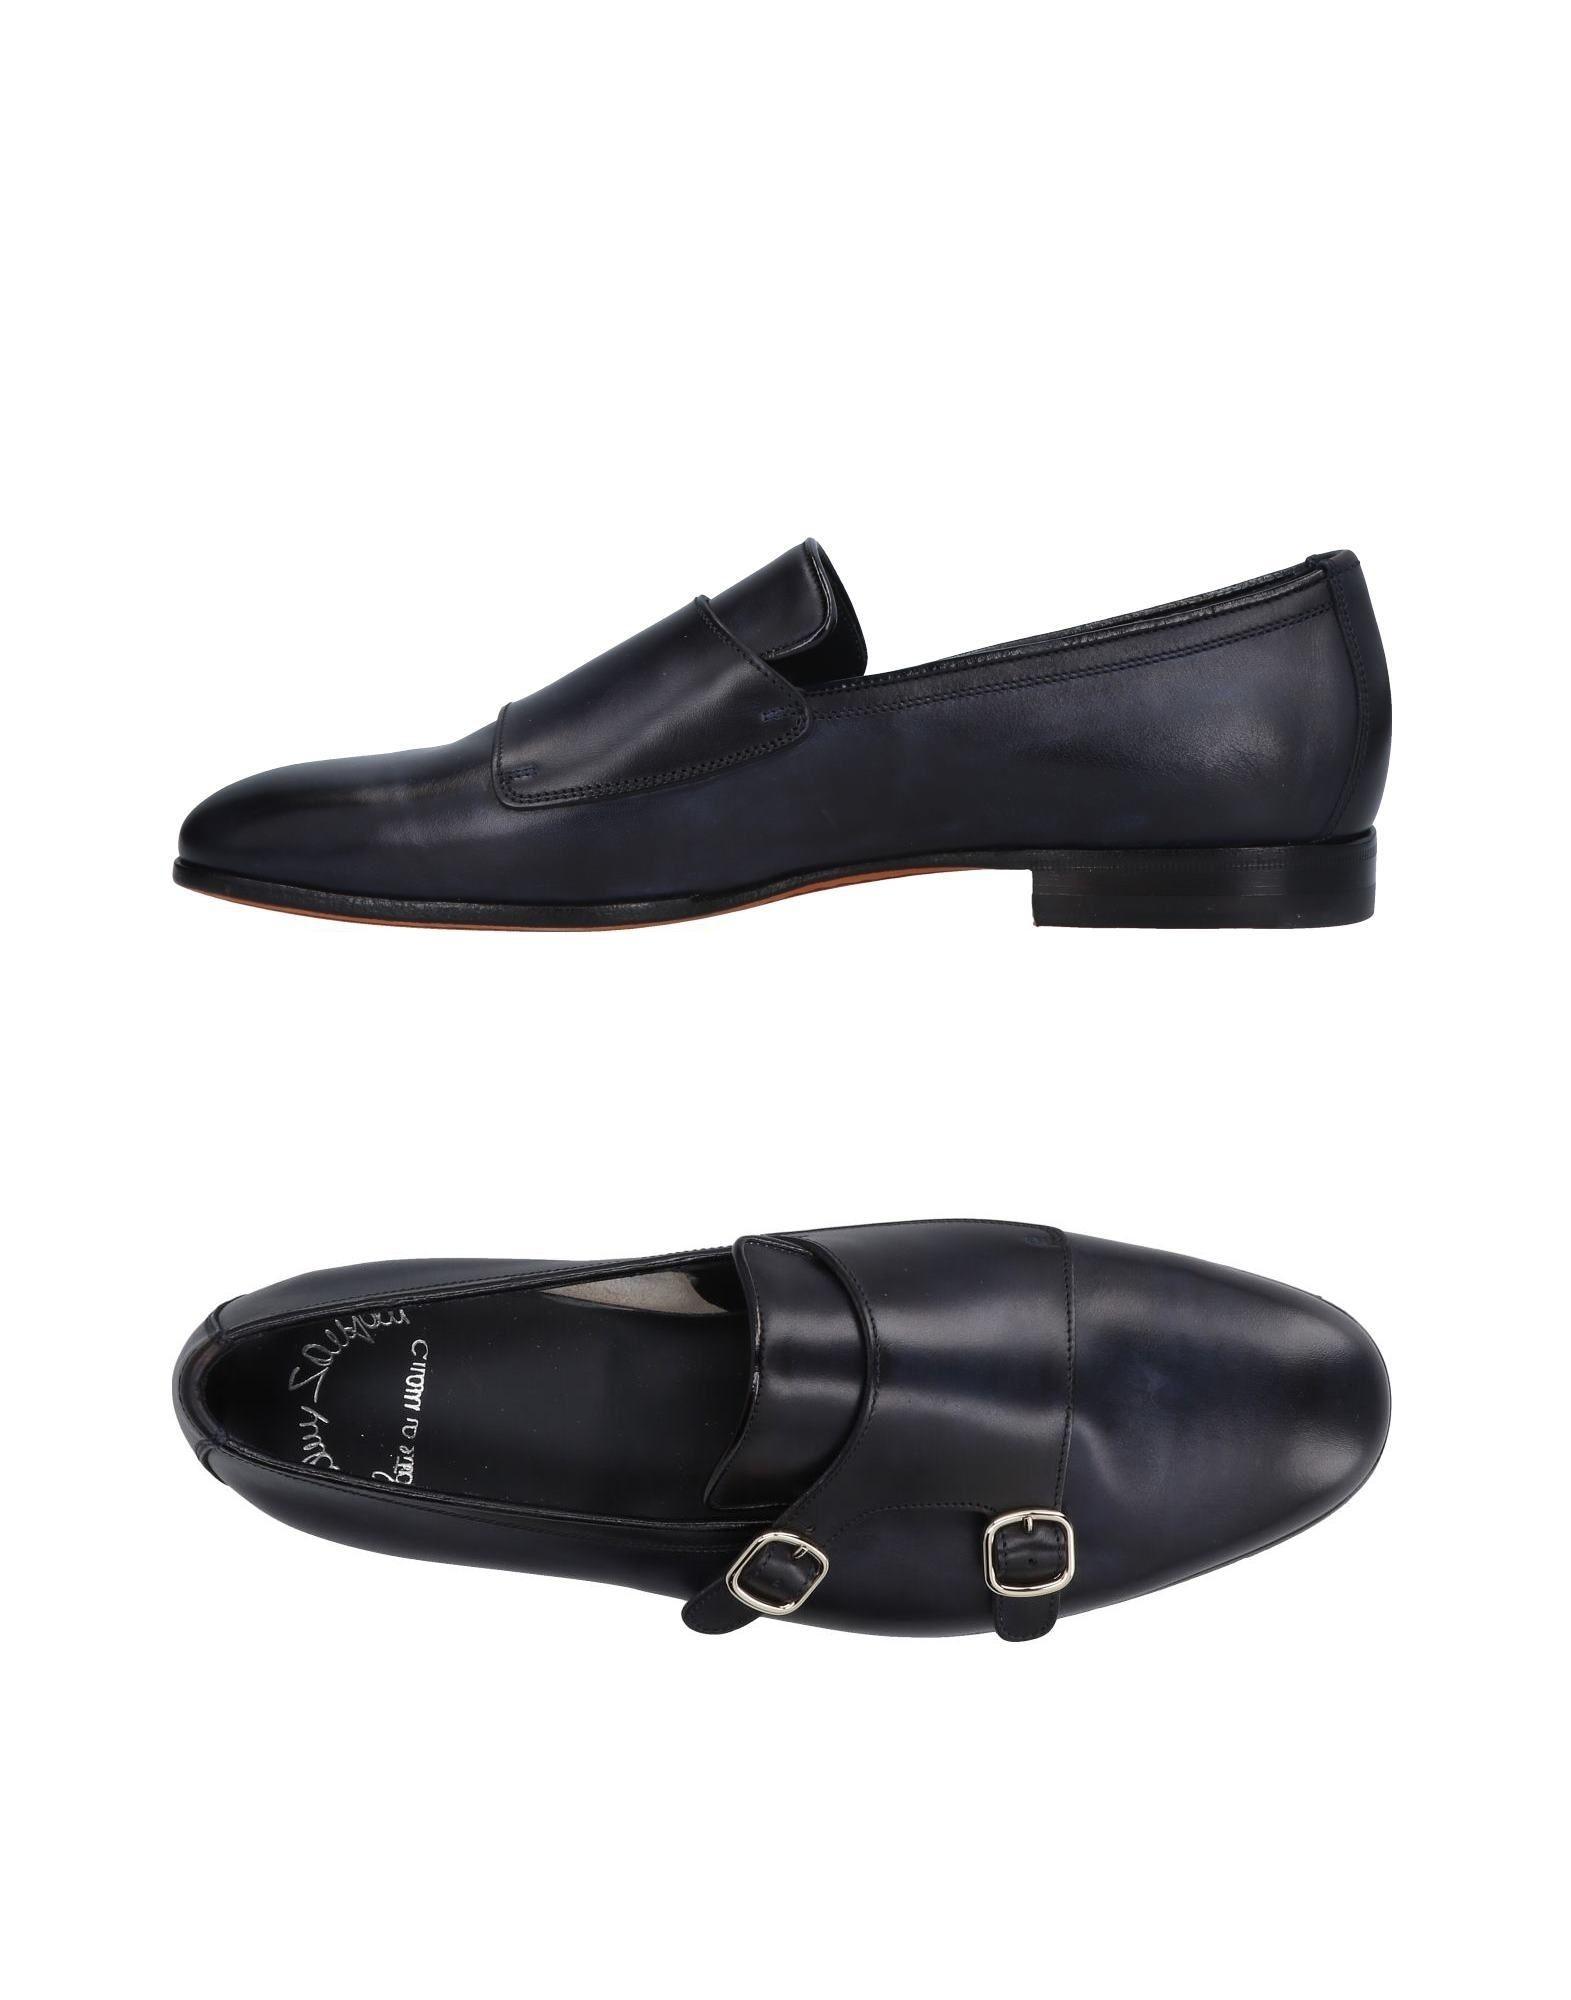 Santoni Mokassins Herren  11478653ST Gute Qualität beliebte Schuhe